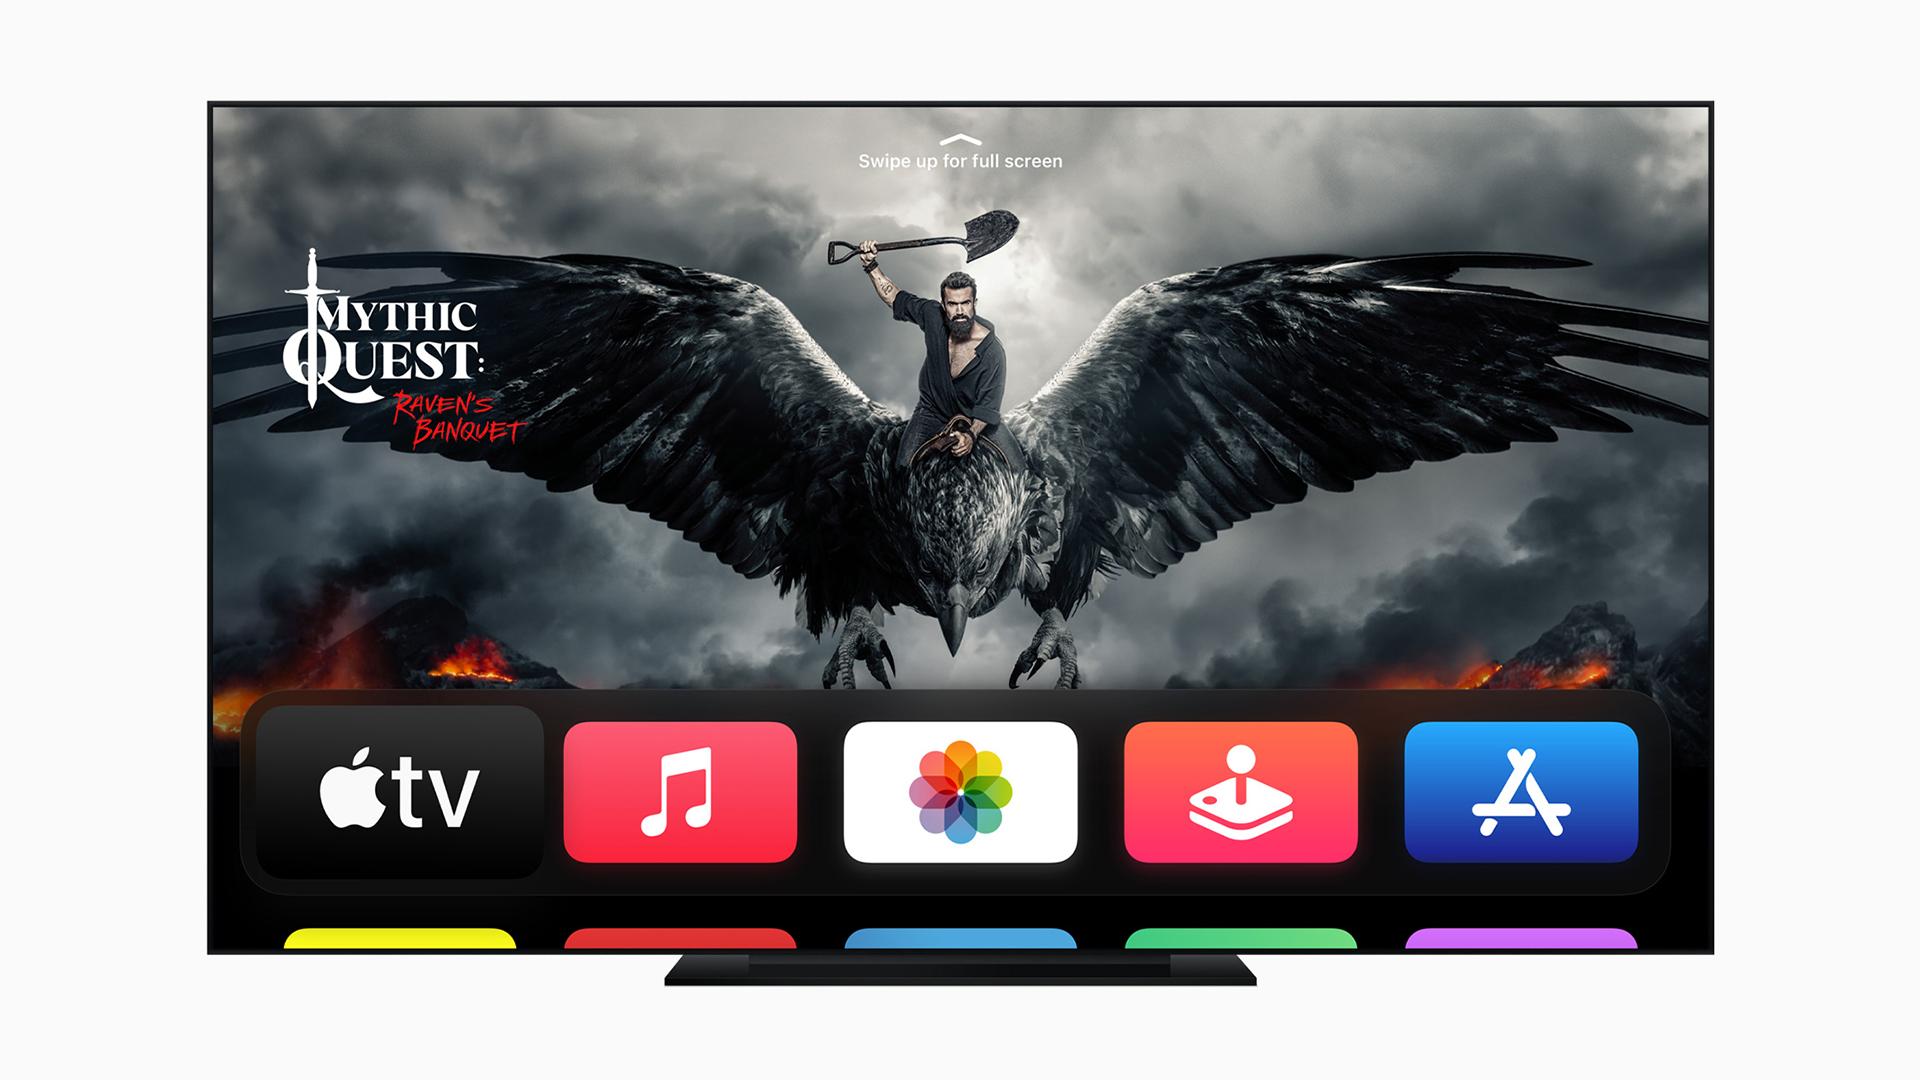 apple tv 4k tvos 14